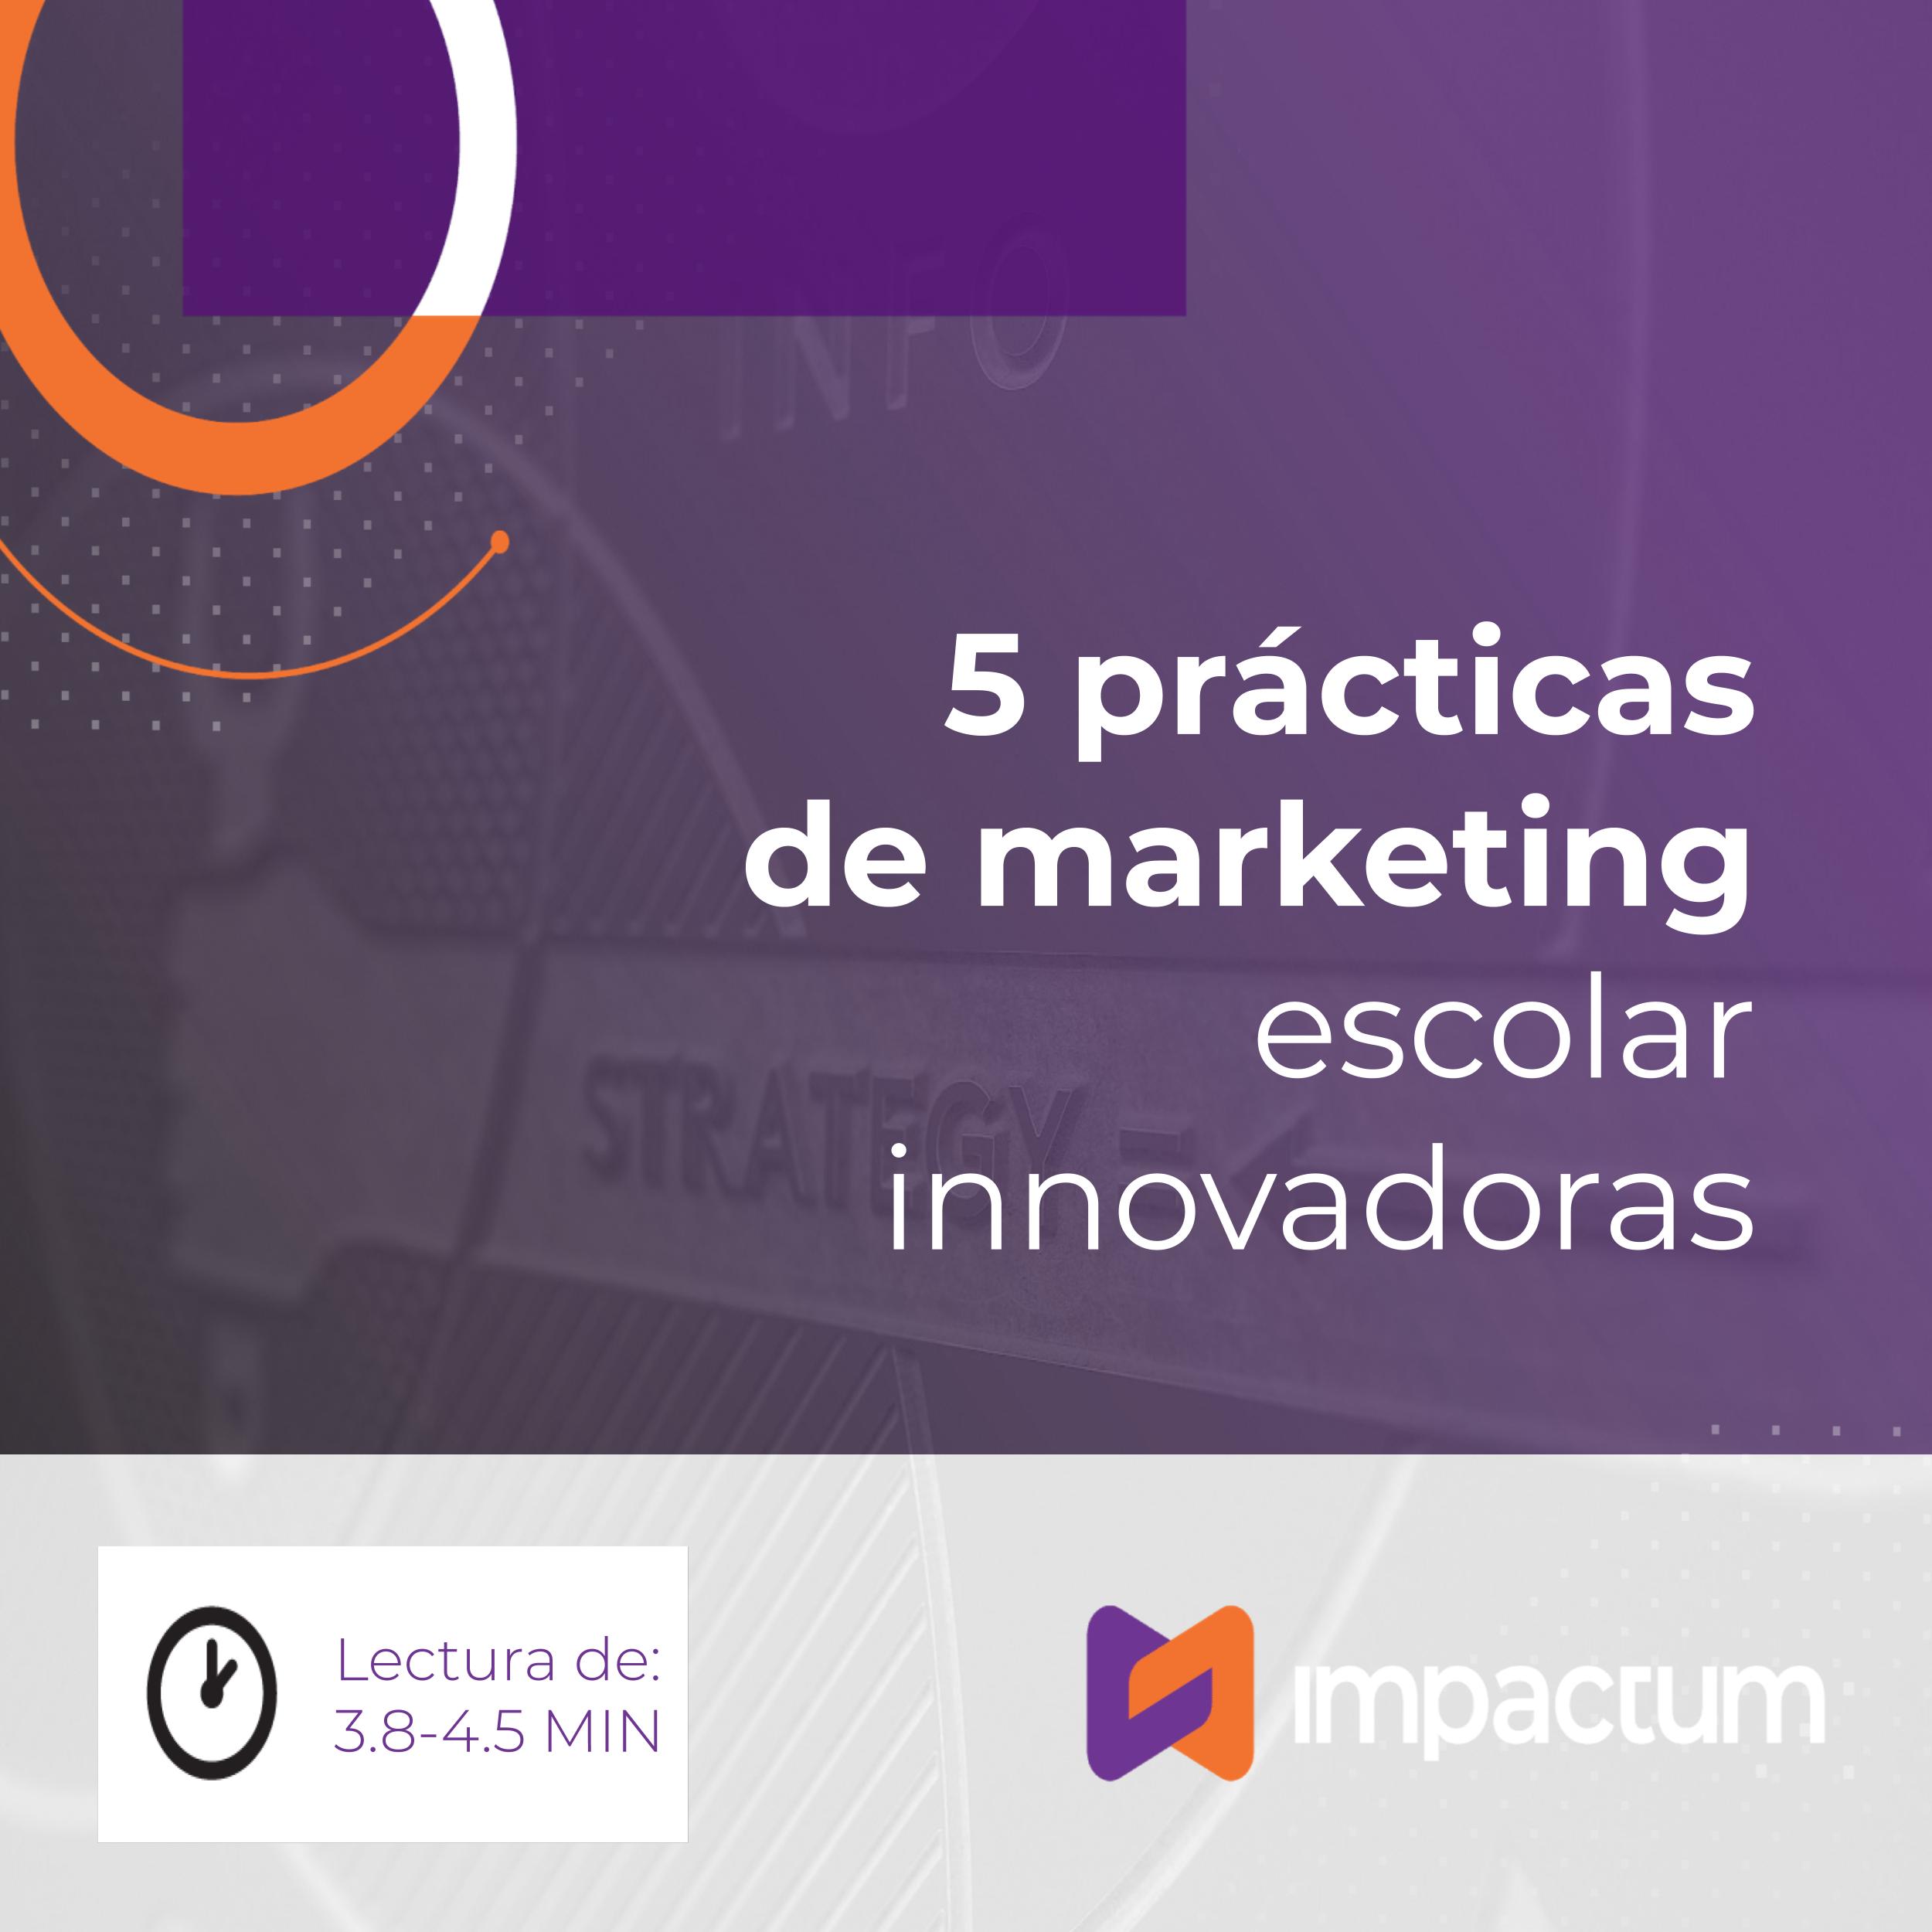 5 Prácticas de marketing escolar innovadoras